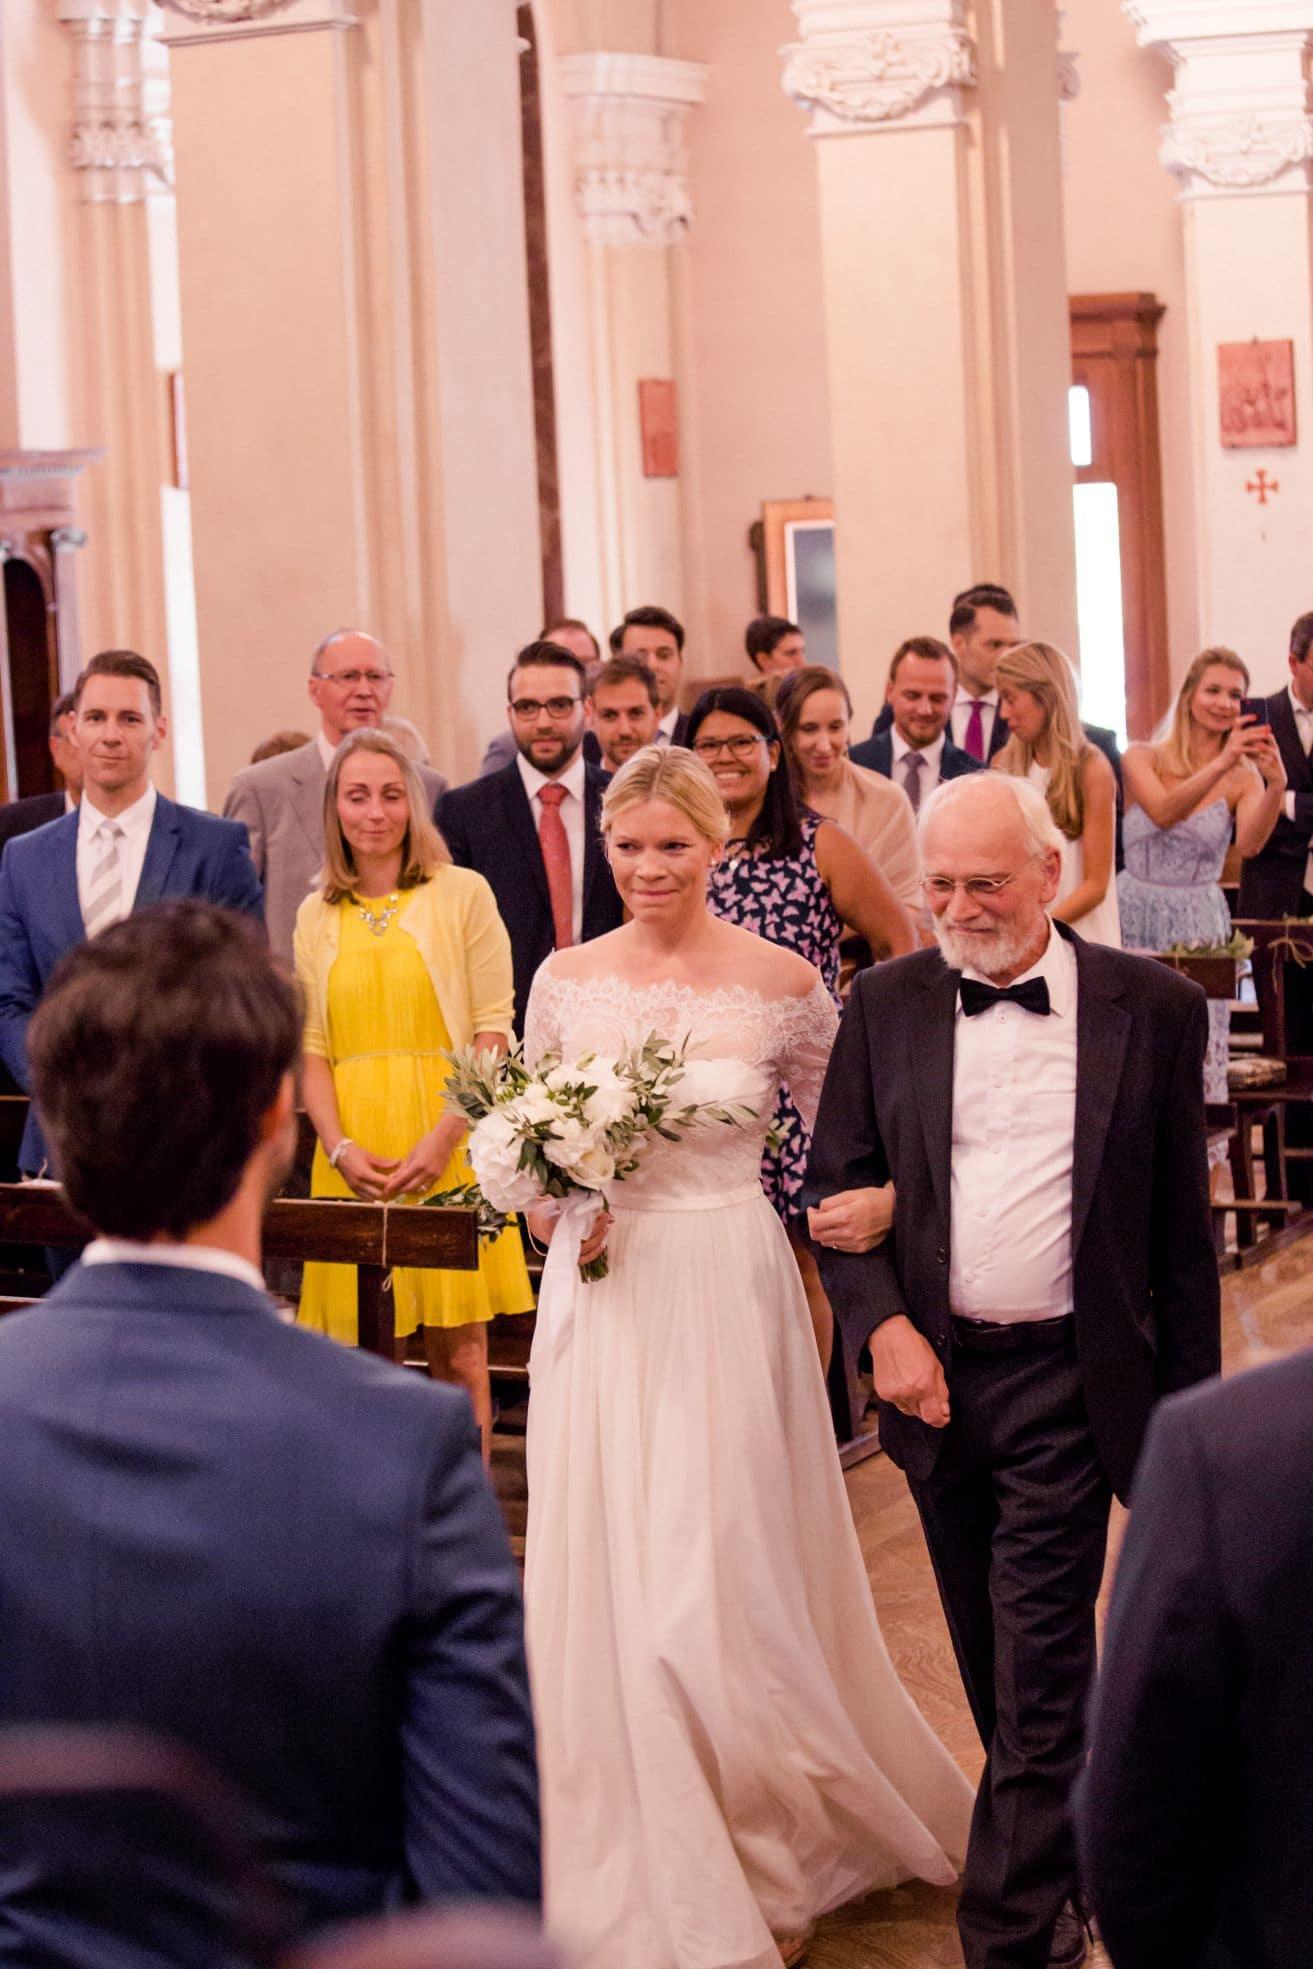 Million Memories_A&D_Hochzeitsfotograf_Schlosshochzeit_Toskana_Lago Di Como_Wedding_Tuscany_091